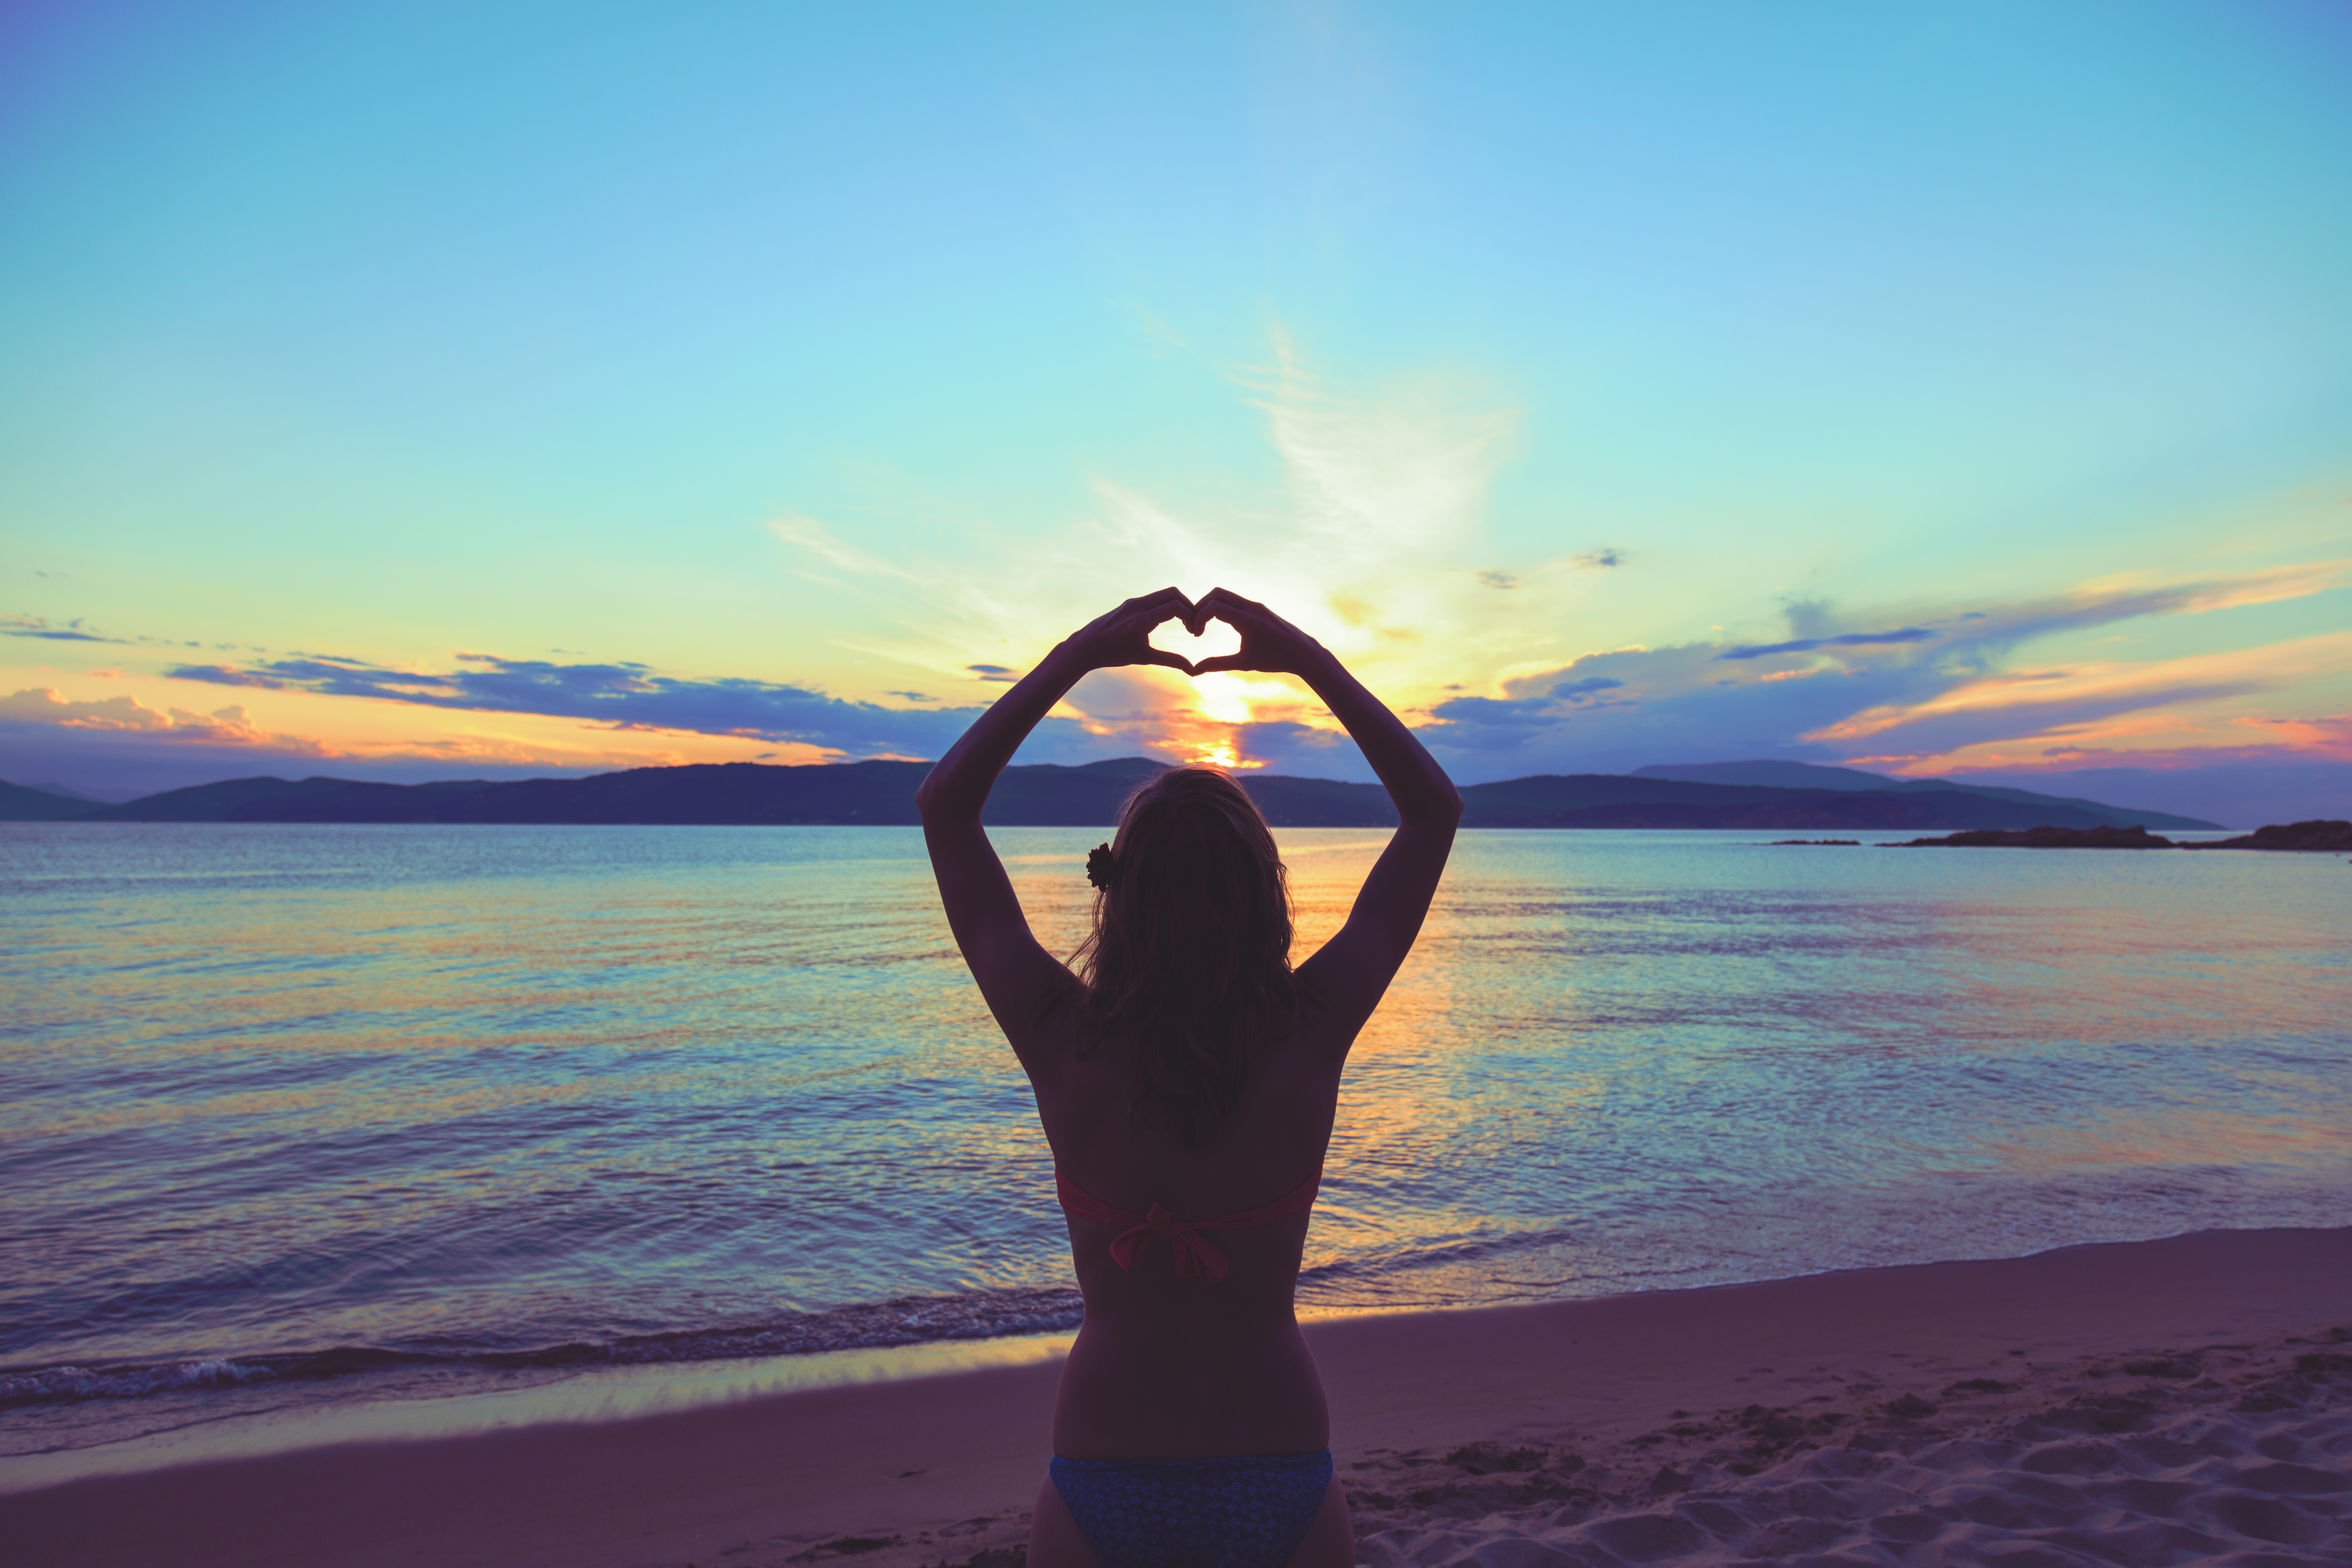 girl,holding,a,heart,shape,for,the,ocean,/,sea.